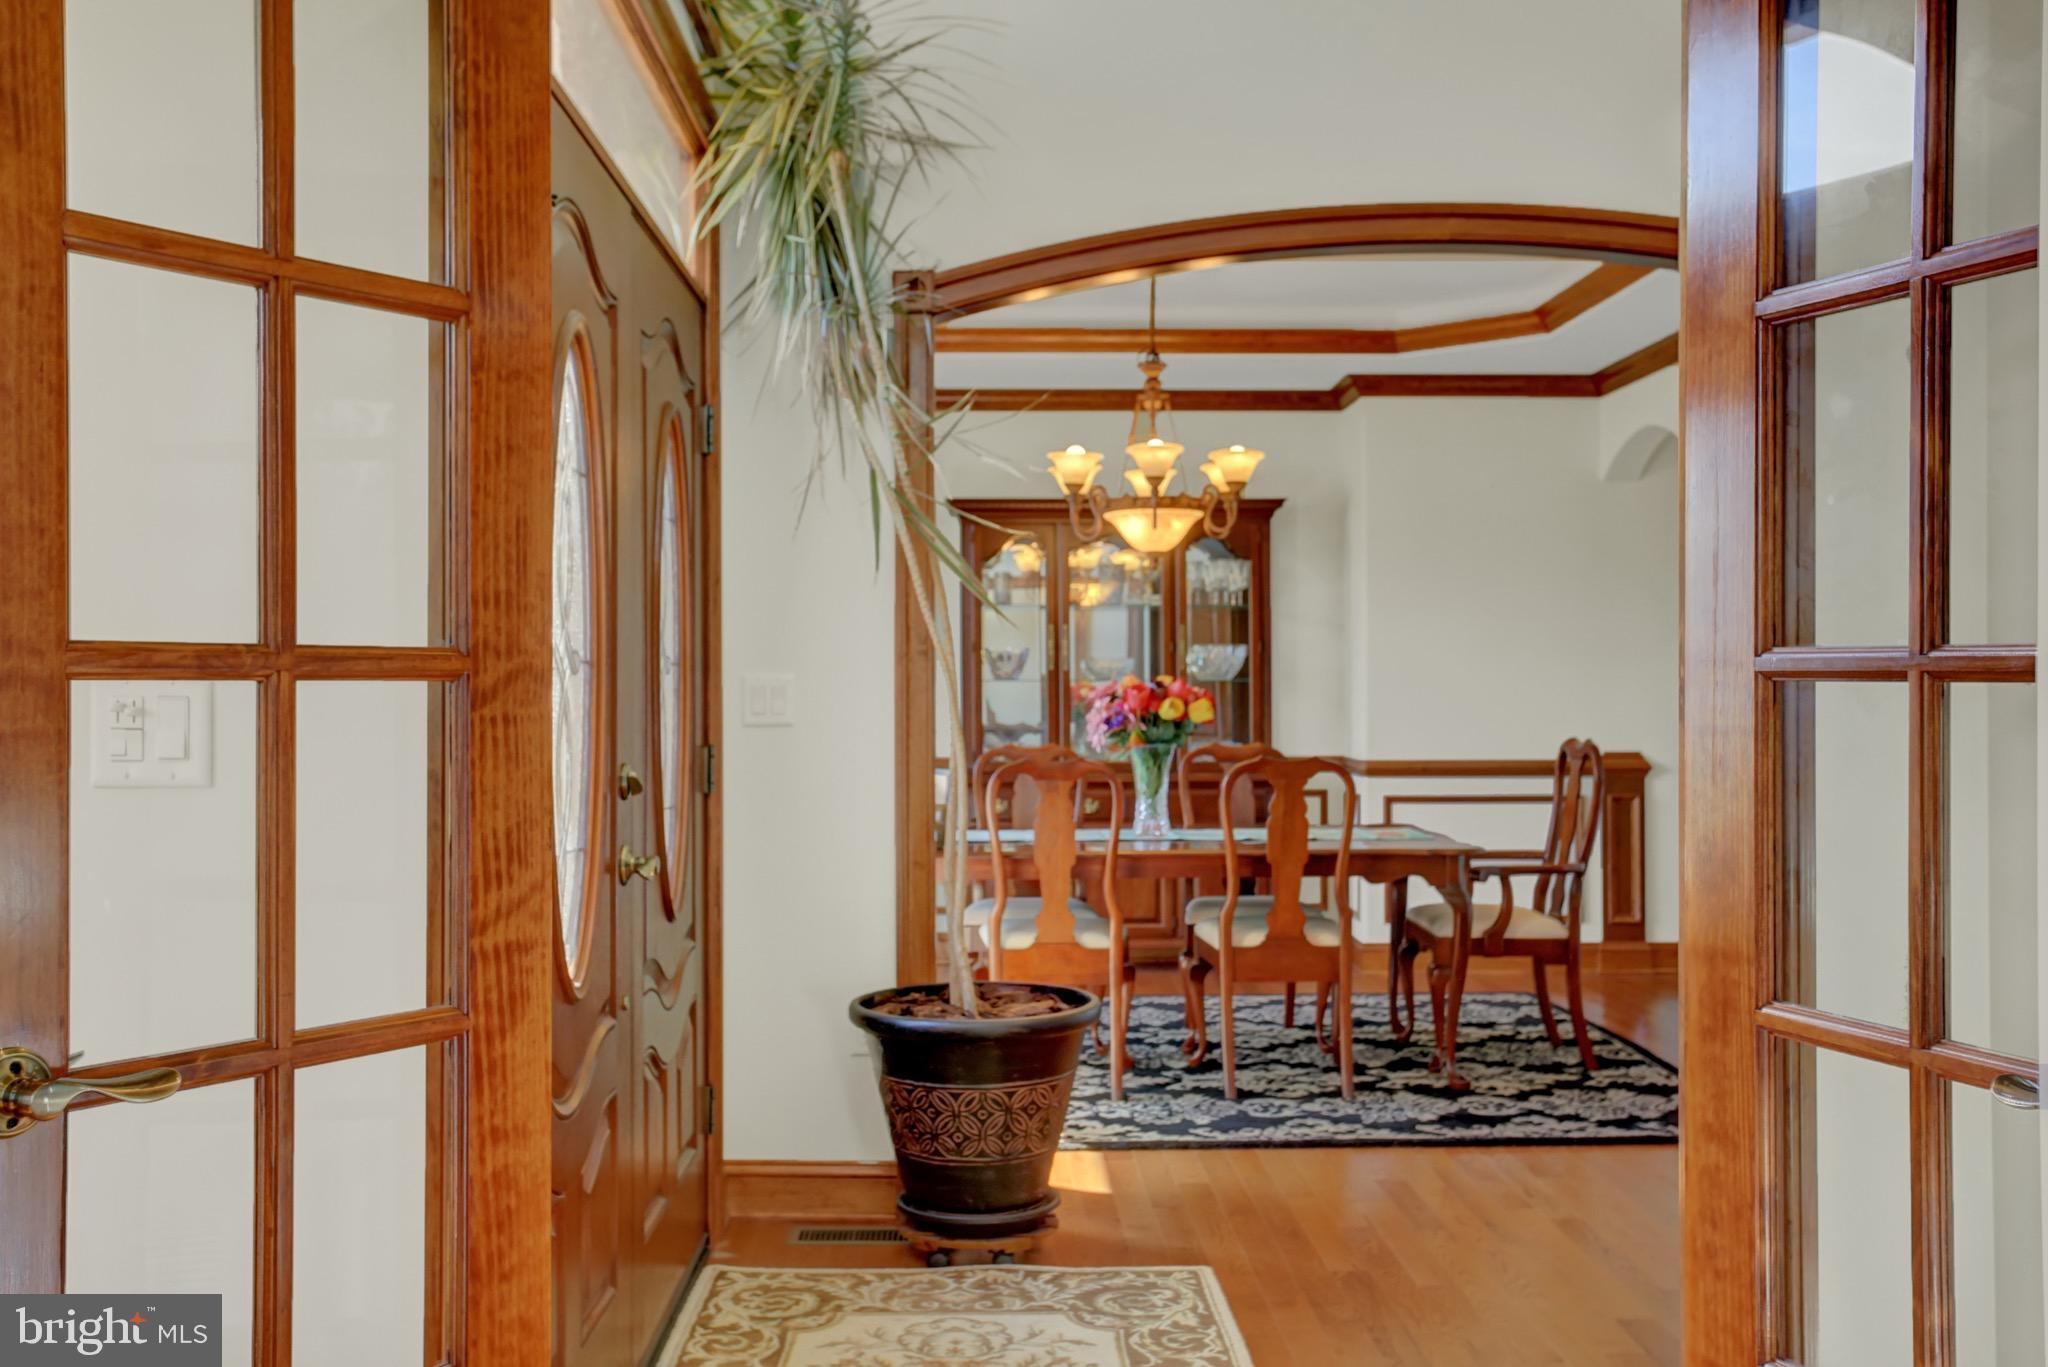 Living room double glass doors open onto foyer.